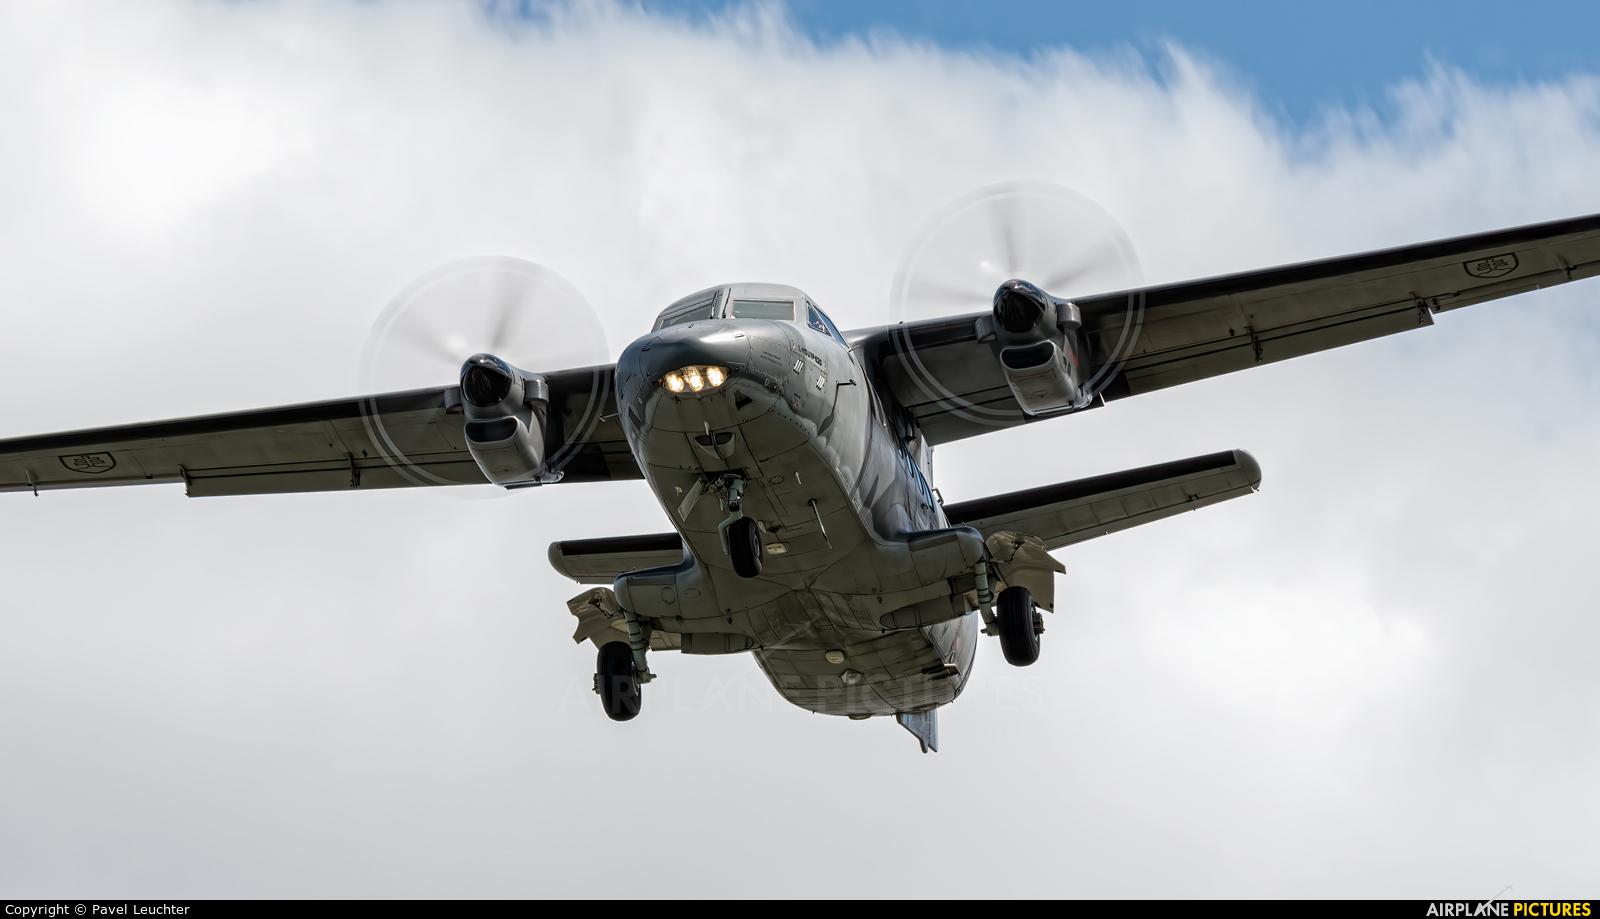 Slovakia -  Air Force 2901 aircraft at Pardubice